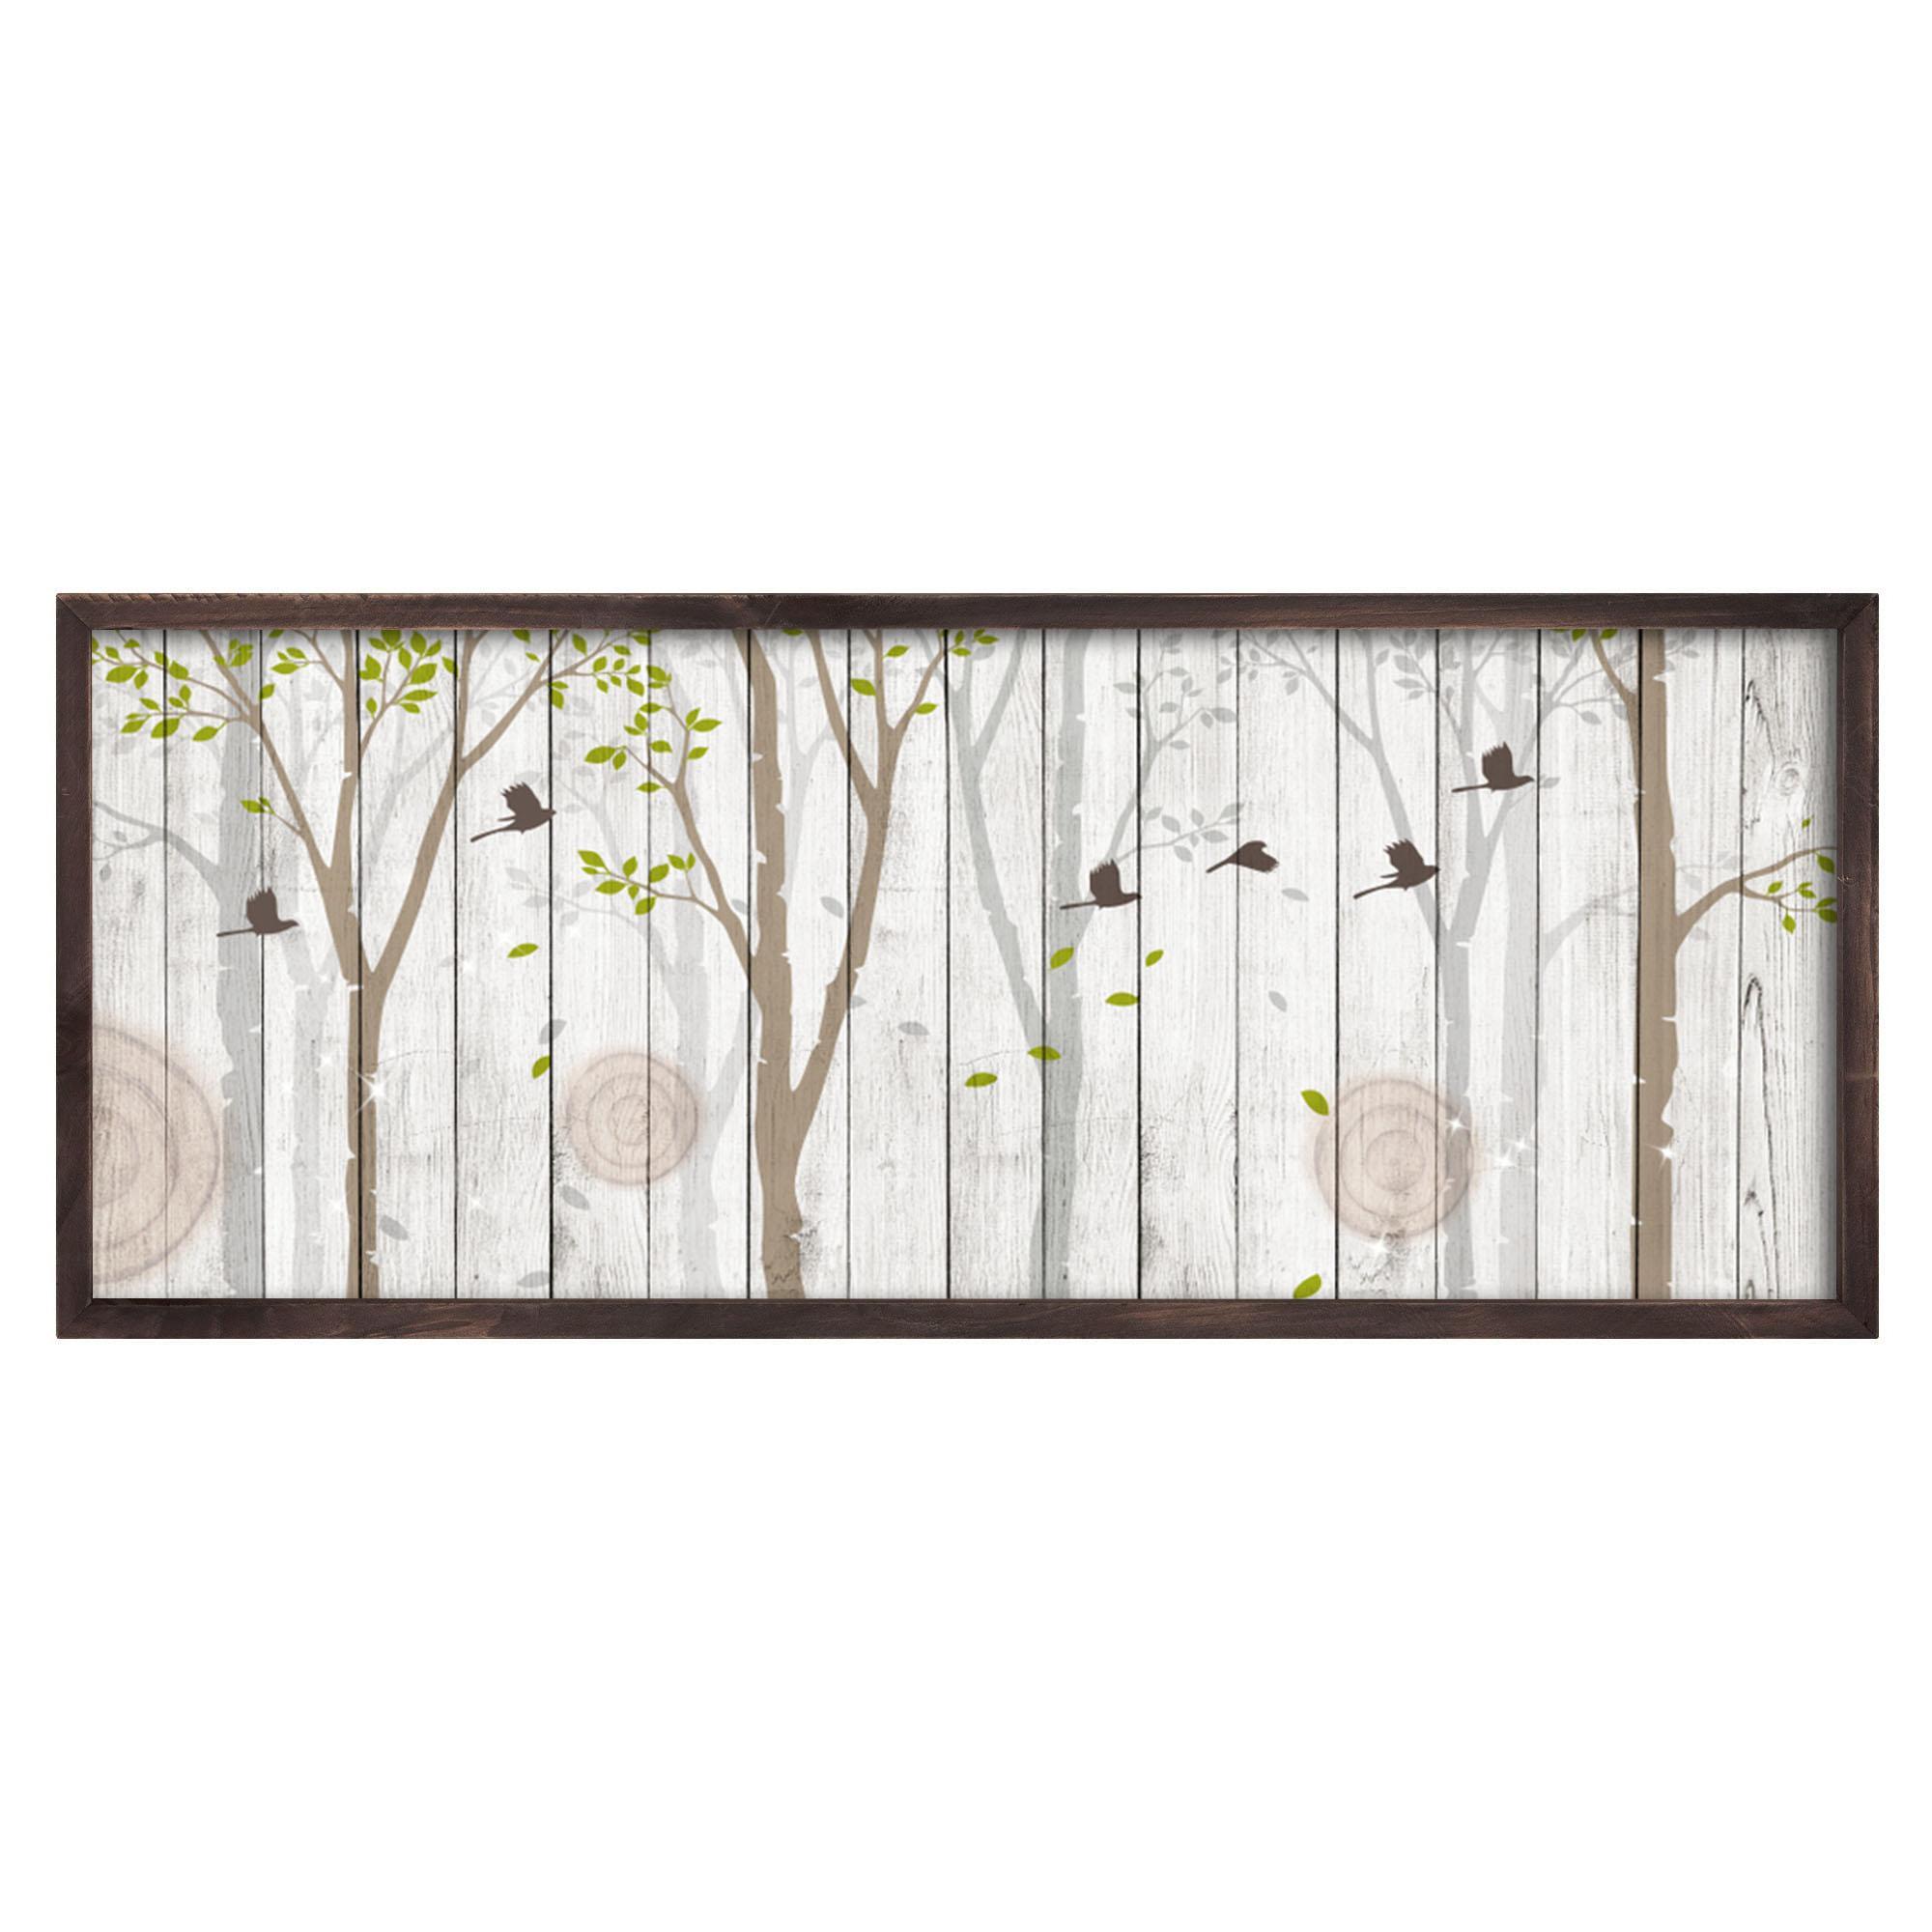 Tablou 60x120 cm - Oyo Concept, Multicolor poza